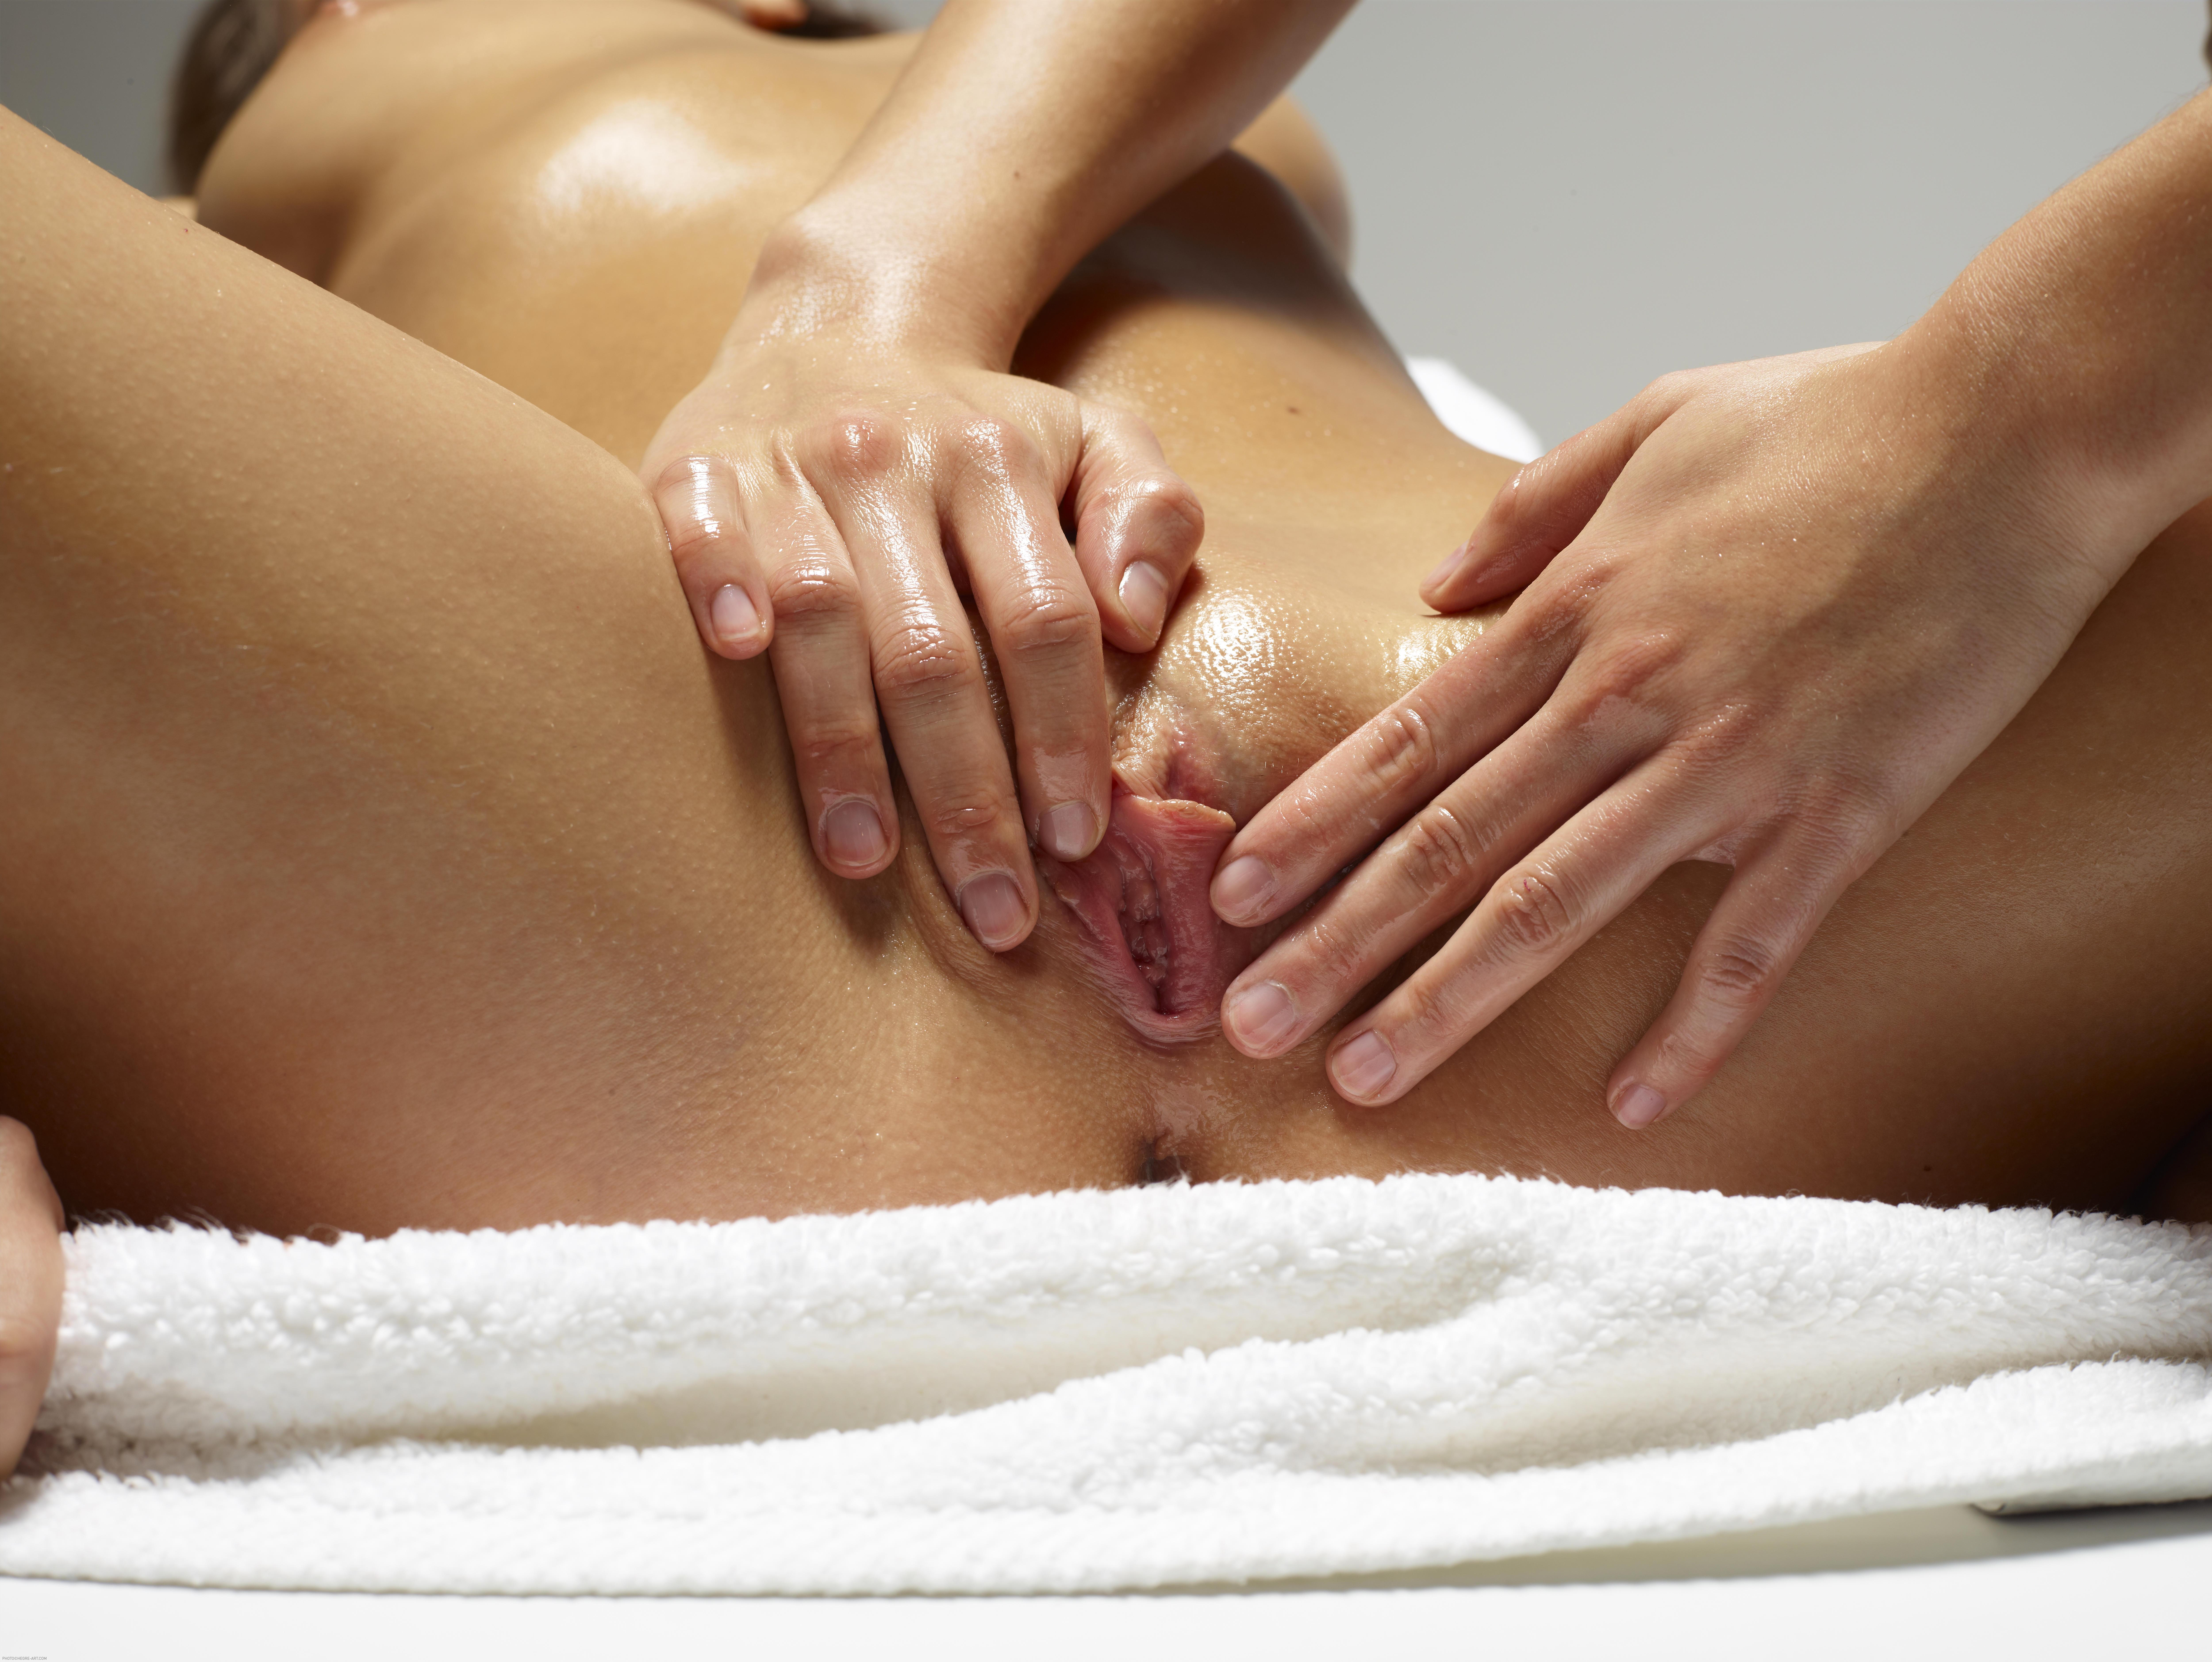 Best Massage Porn 144033  Best File Search Engine  Megaco-4319